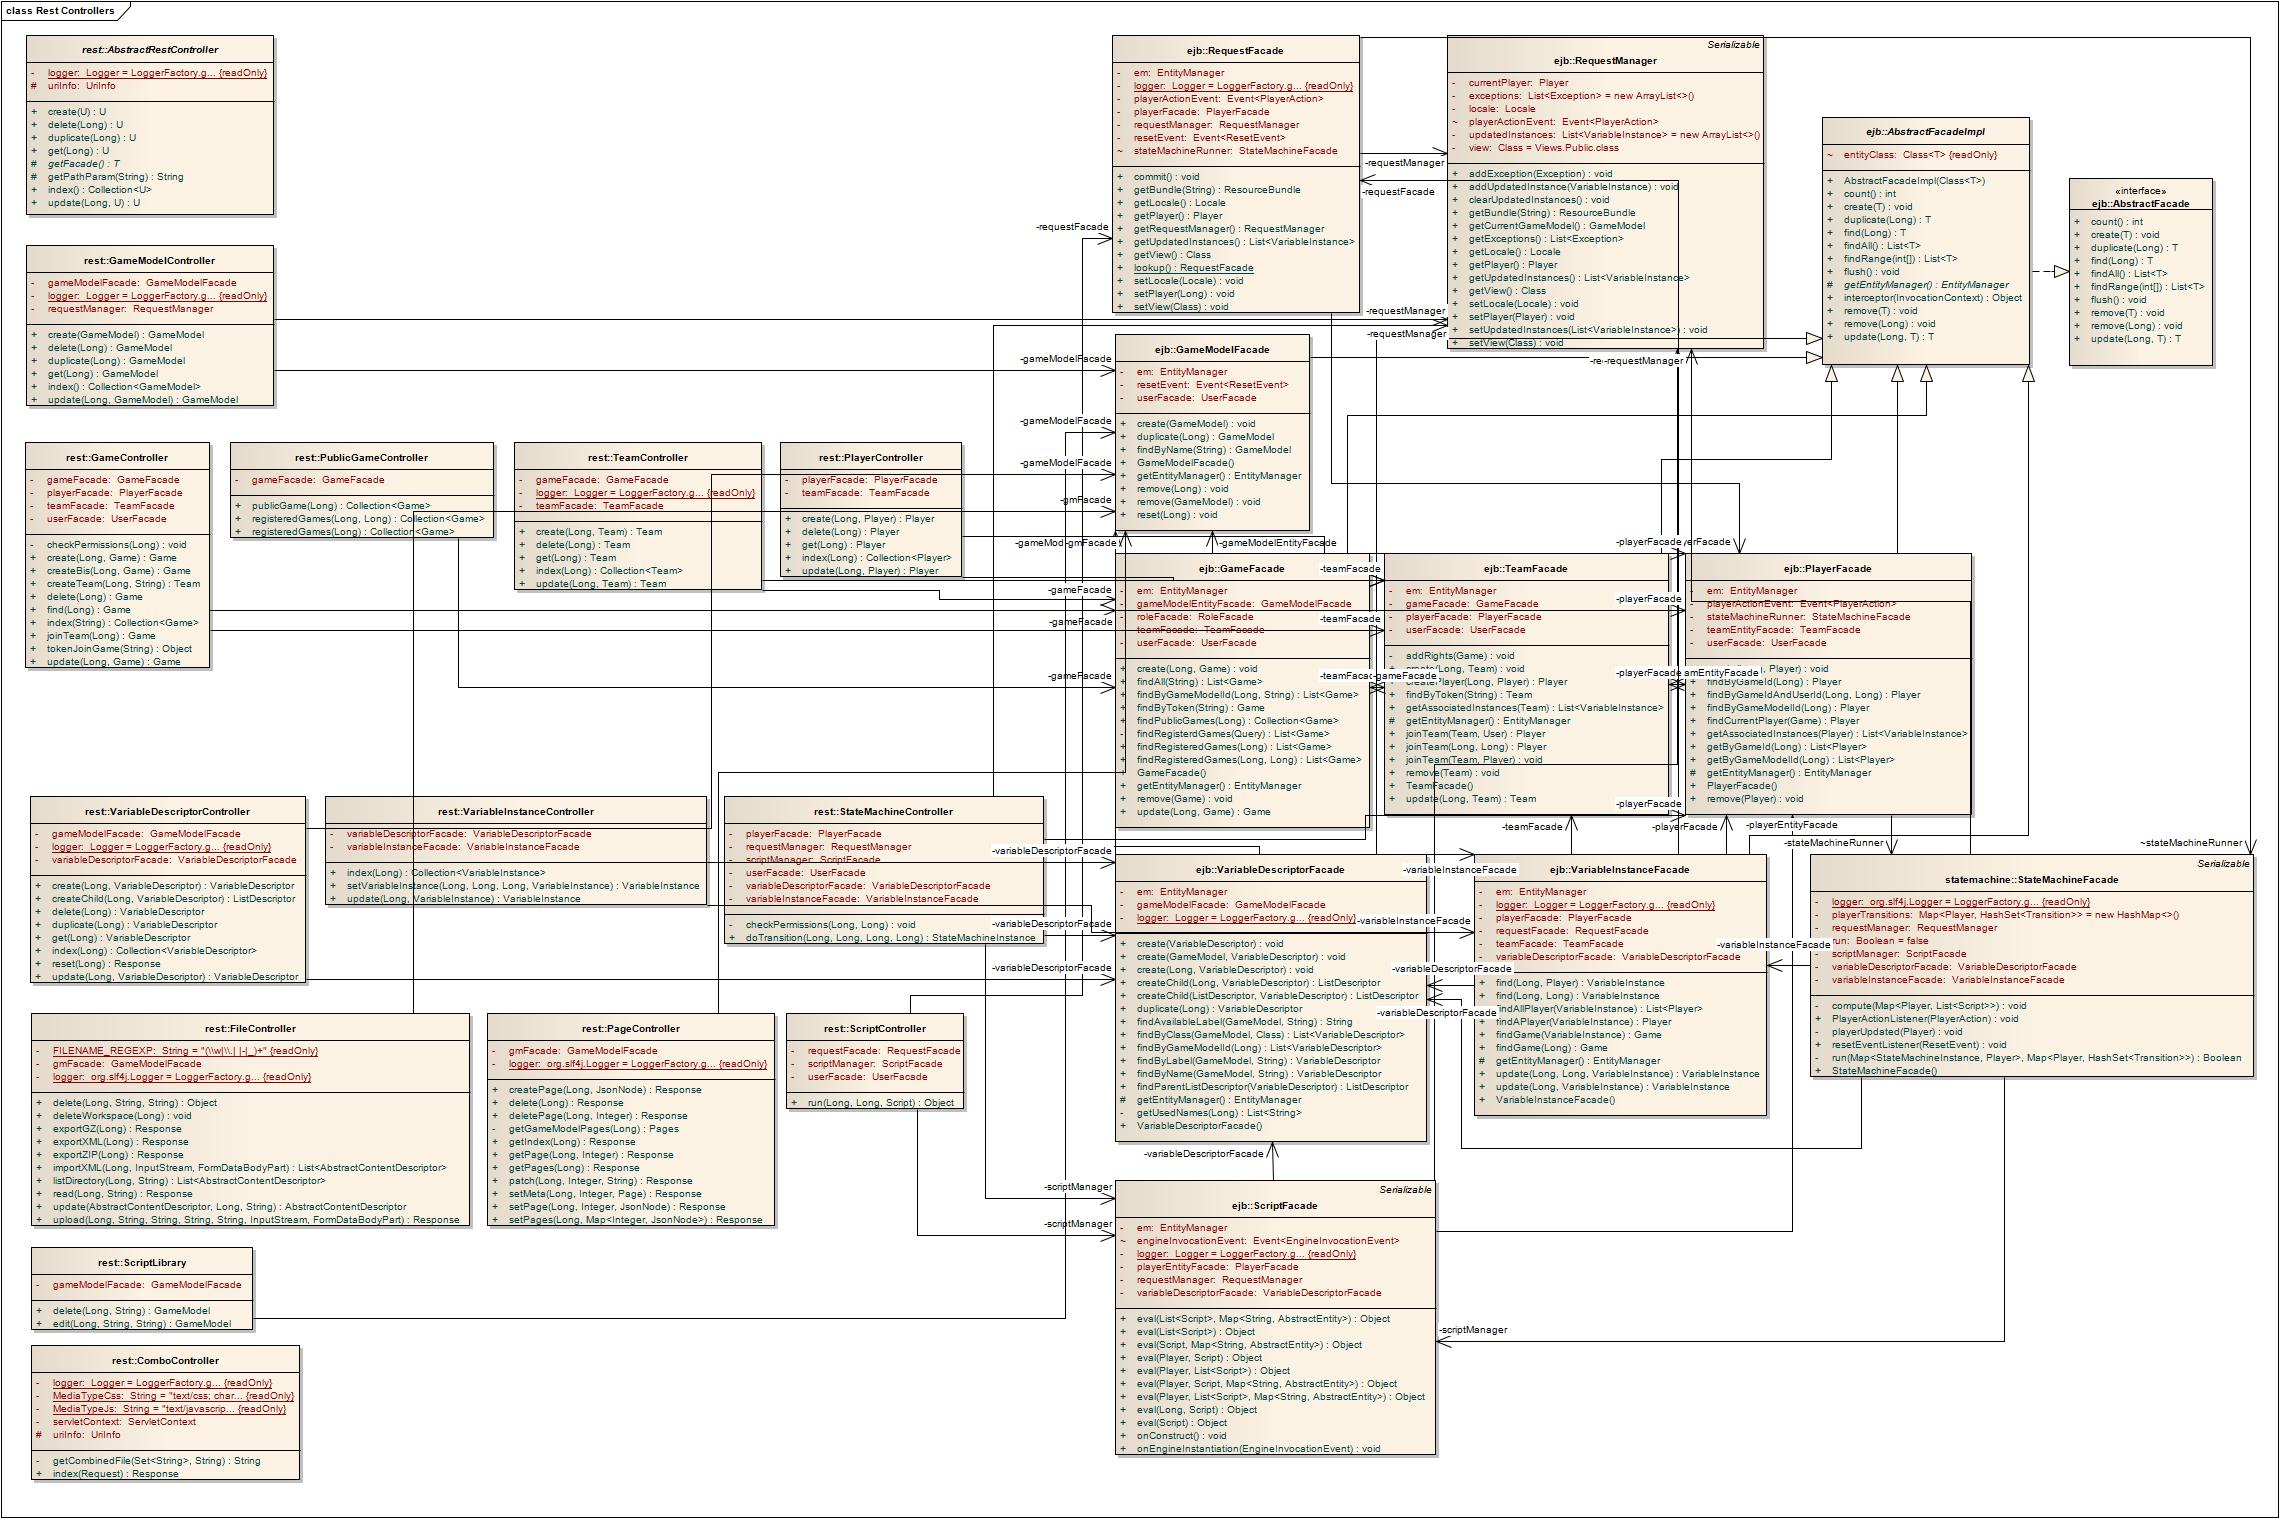 3g network architecture diagram architecture uml middot heigvd wegas wiki middot github